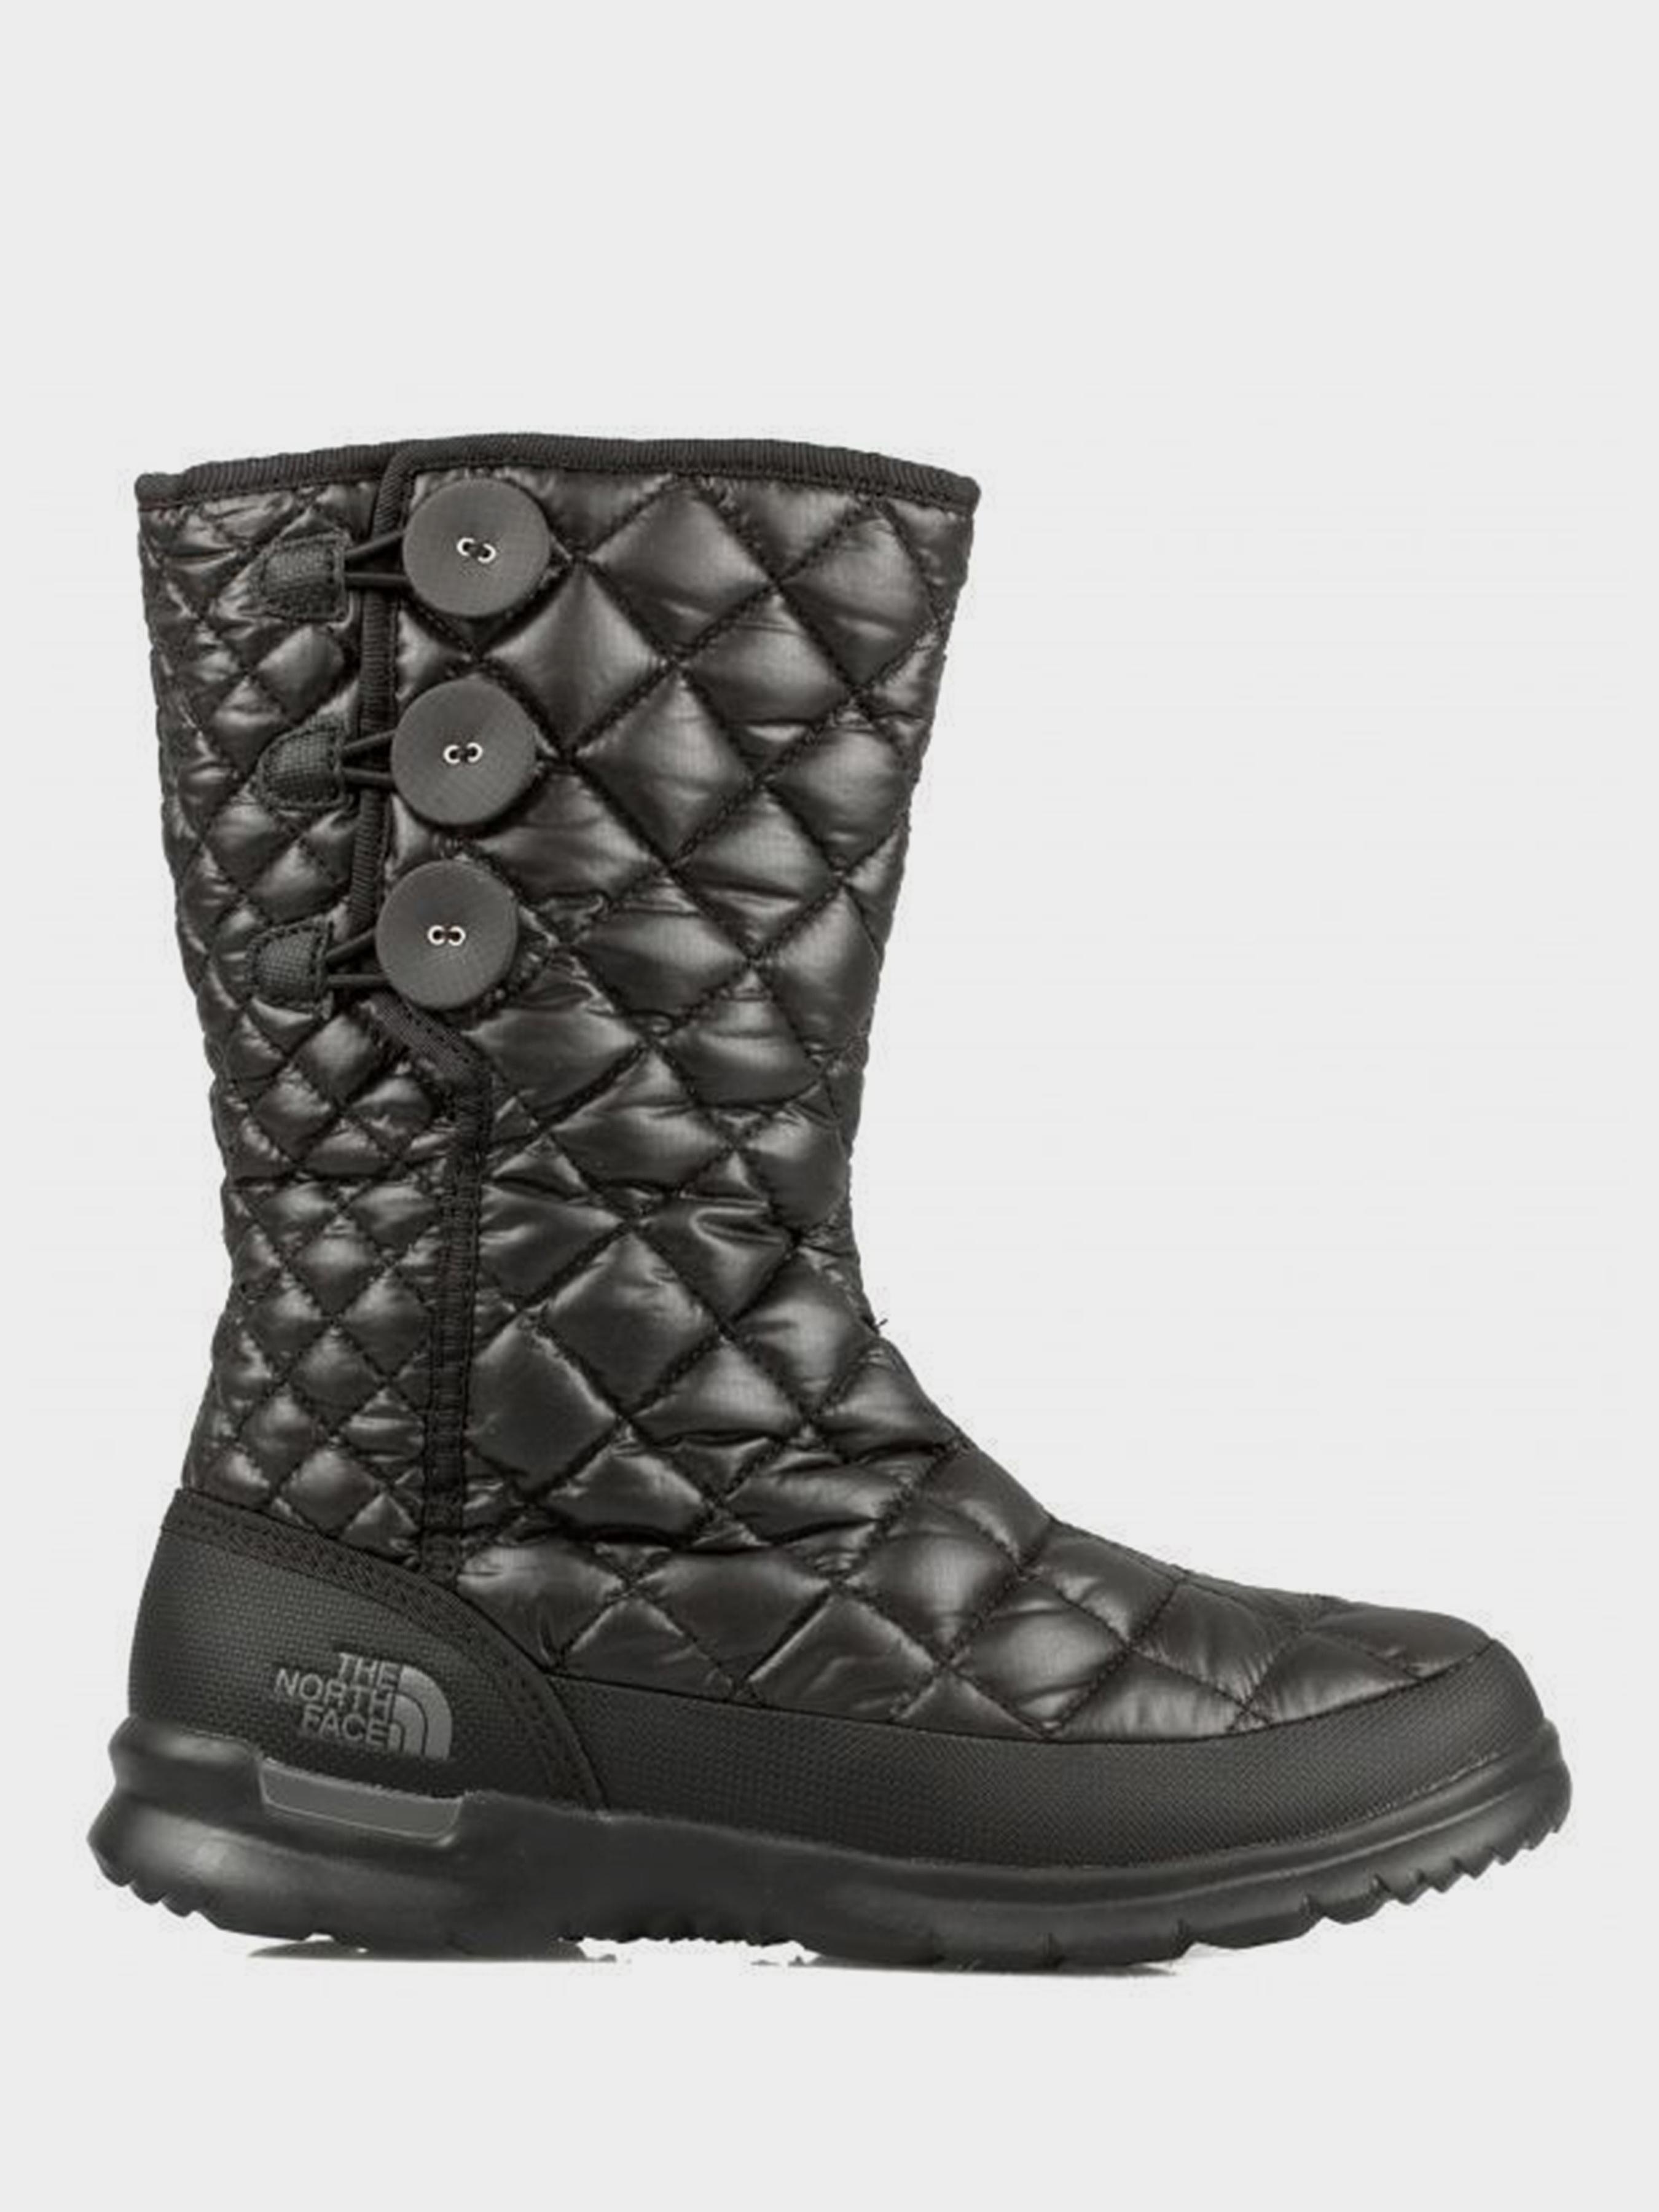 Сапоги женские The North Face THRMOBALL BUTTONUP NO9693 модная обувь, 2017 0464f8f7322